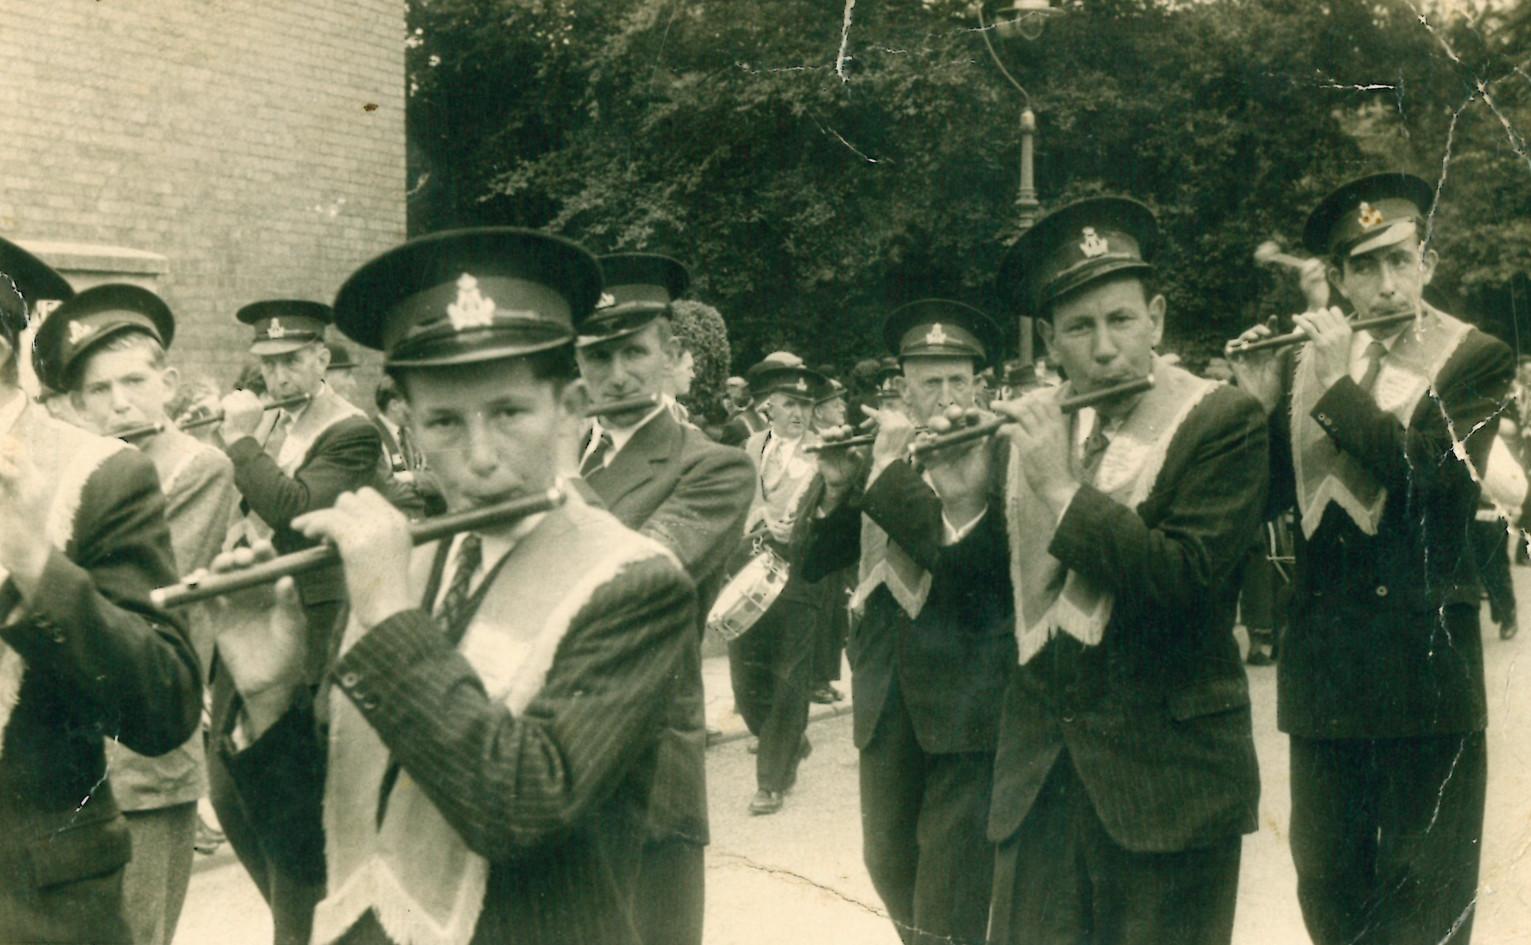 SAD293 Lavin Flute Band on Parade.jpg